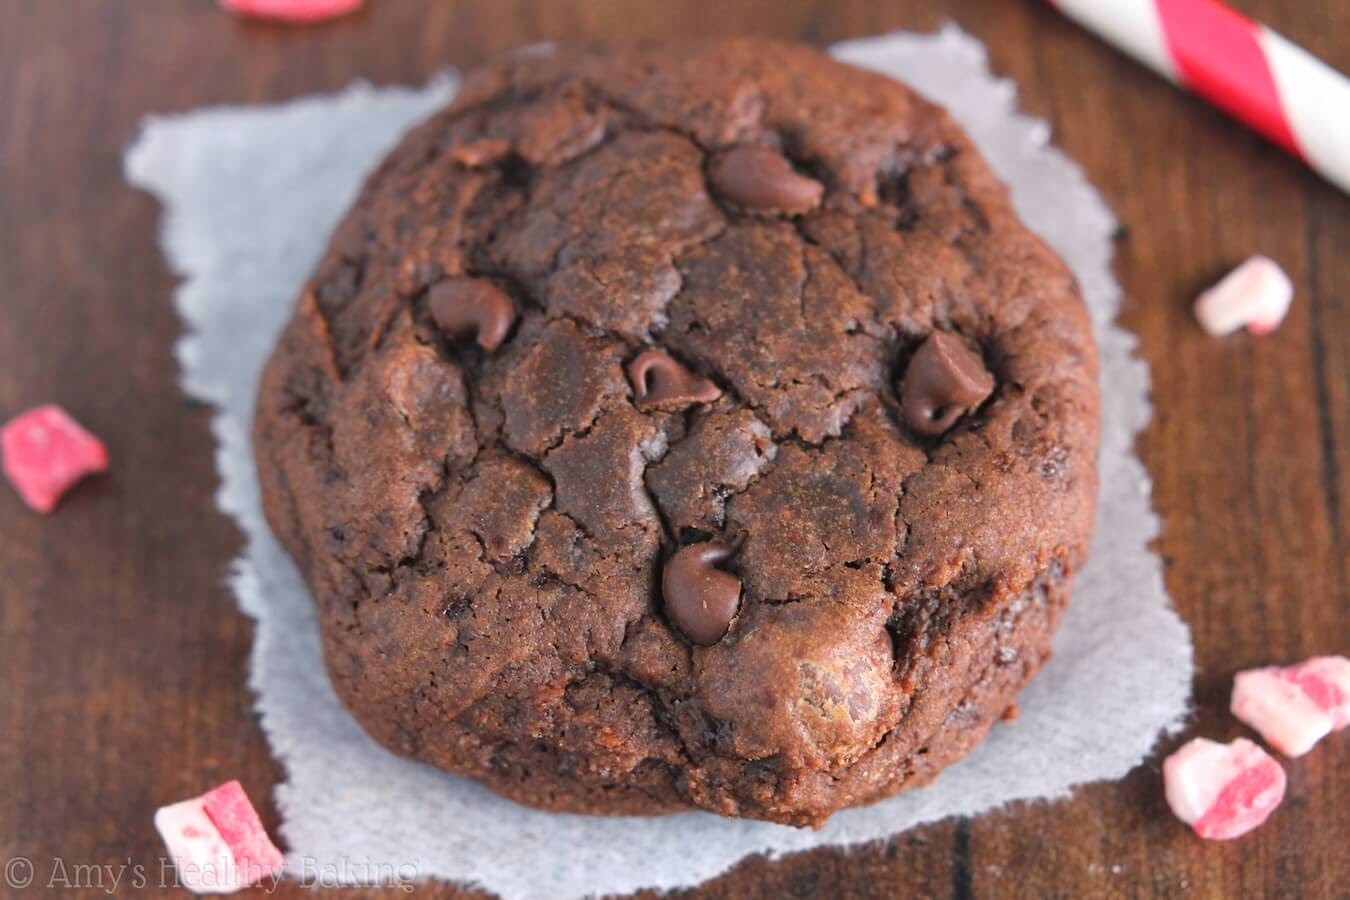 Peppermint Mocha Cookies, Amy's Healthy Baking, 109 calories